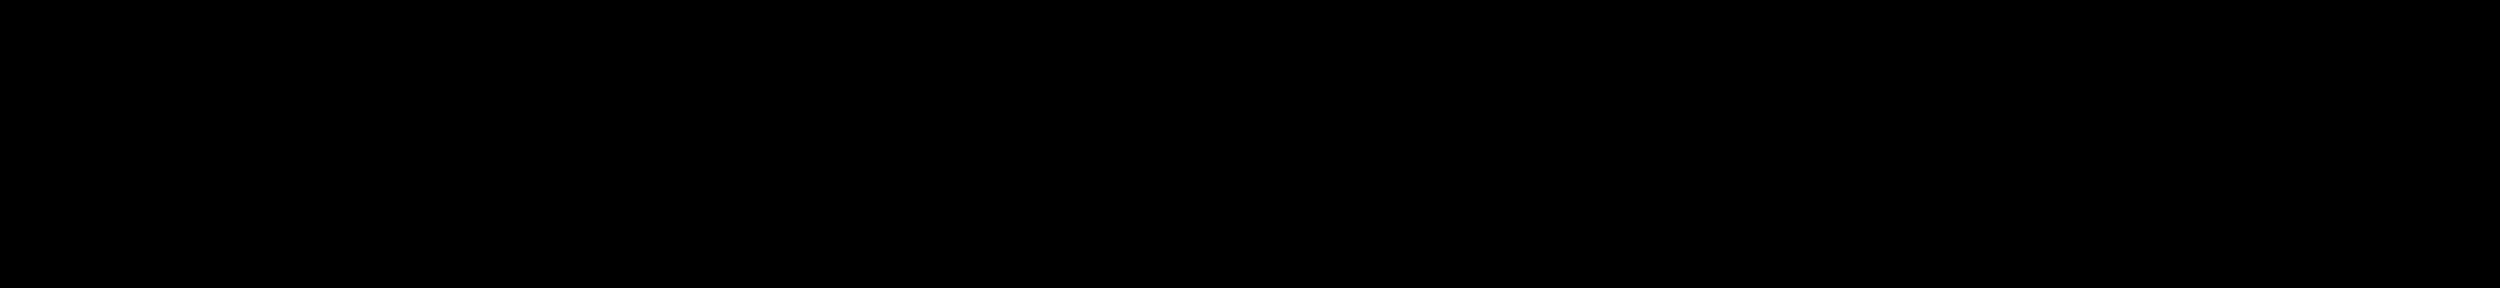 Longform logo black